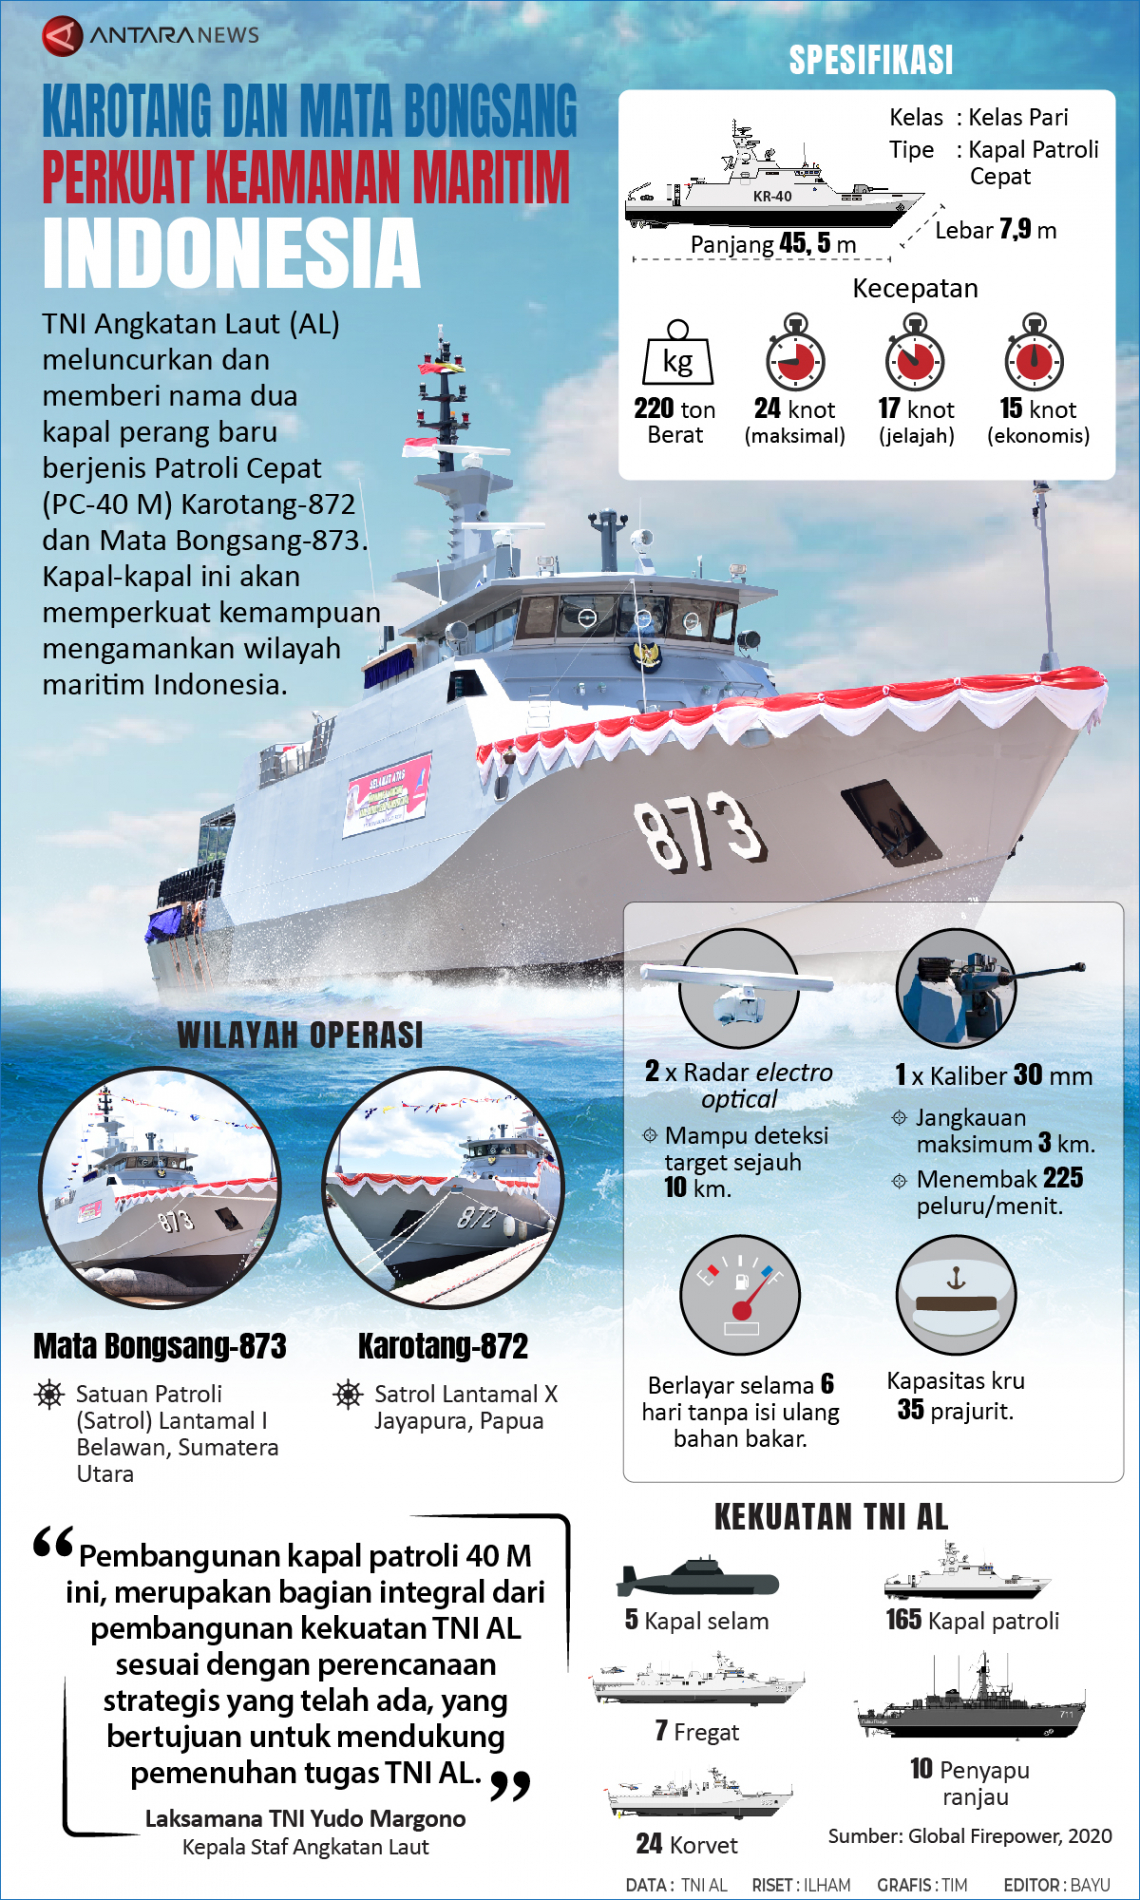 Karotang dan Mata Bongsang perkuat keamanan maritim Indonesia